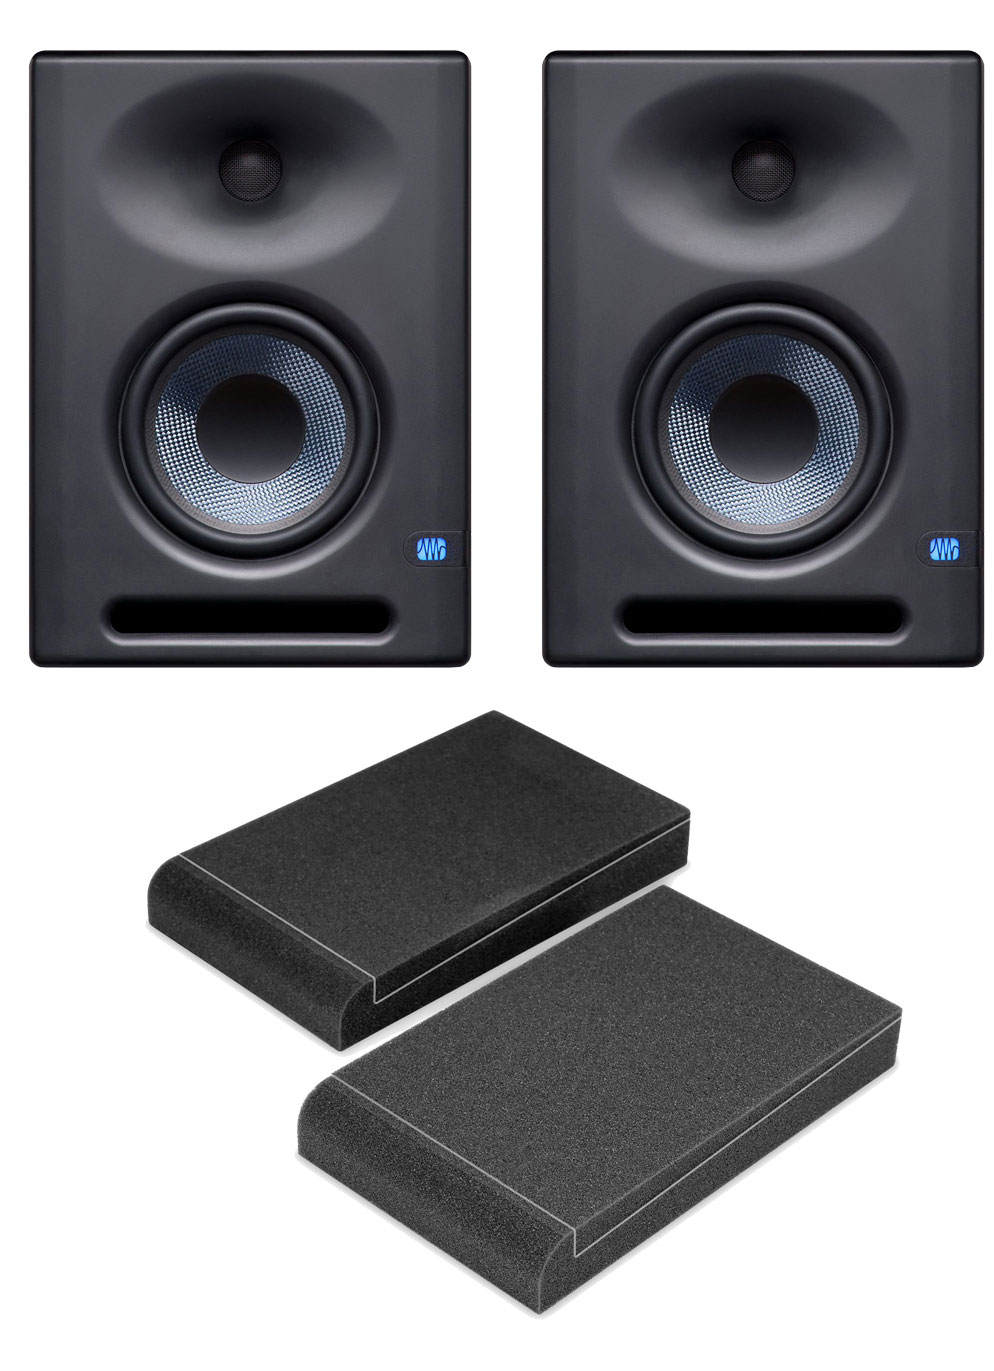 Studiomonitore - Presonus Eris E5 XT Aktives Studiomonitor Paar inkl. Absorberplatten - Onlineshop Musikhaus Kirstein